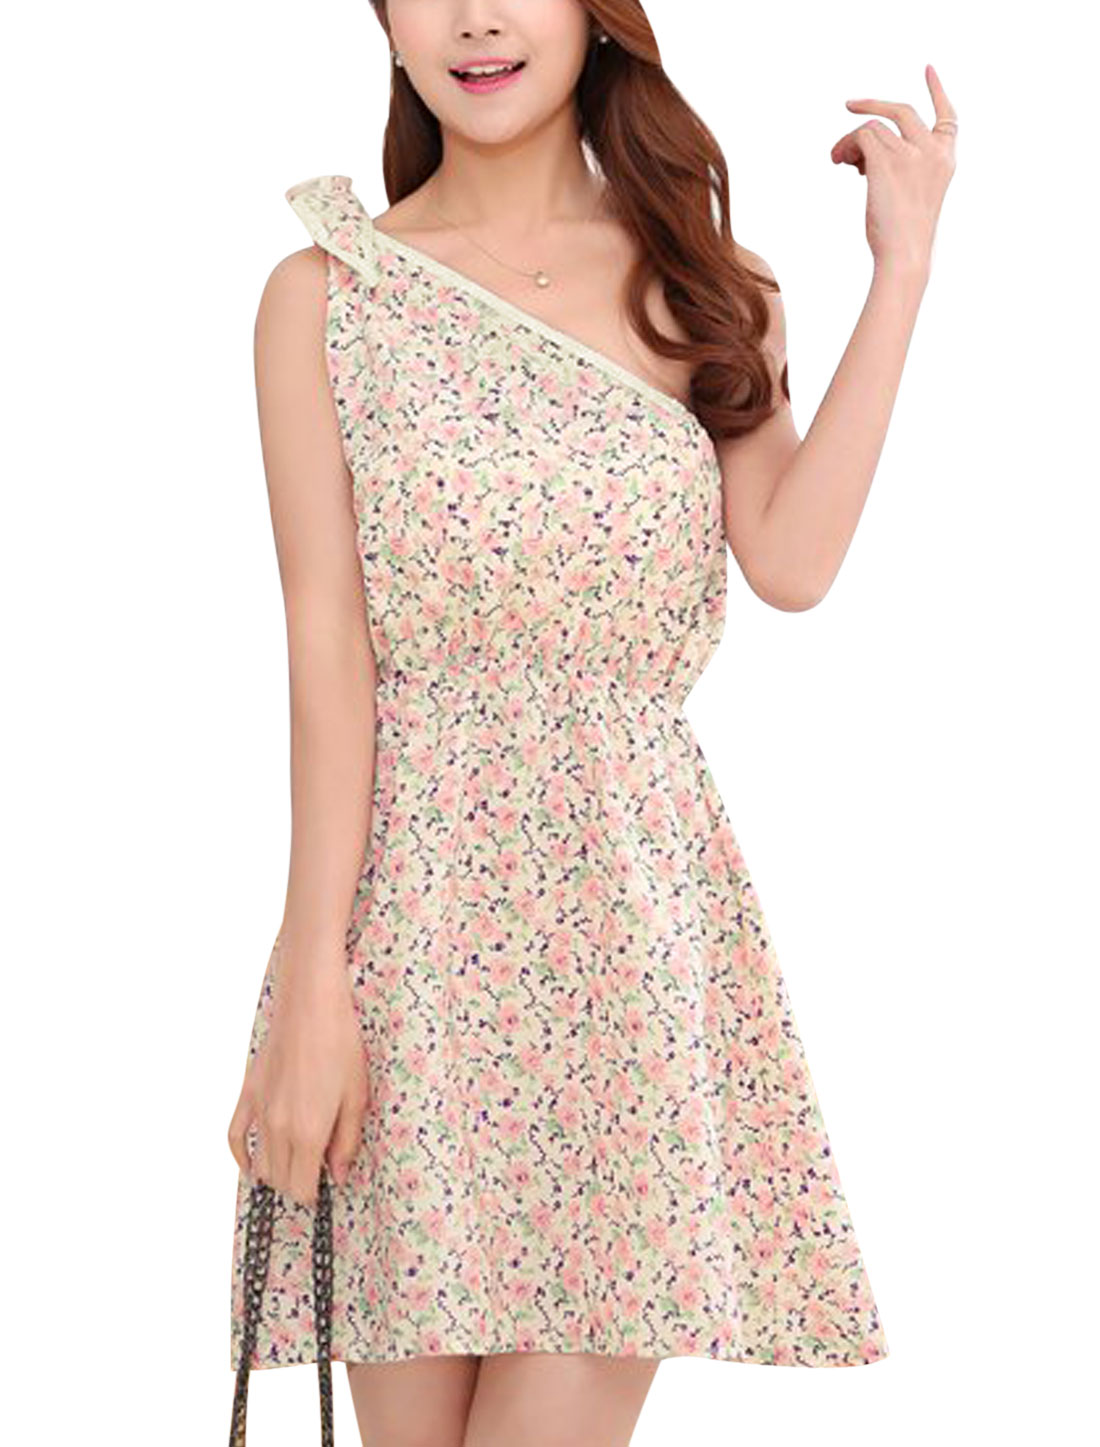 Women Flower Print Summer Self Tie Shoulder Casual Dress Pink Beige XS